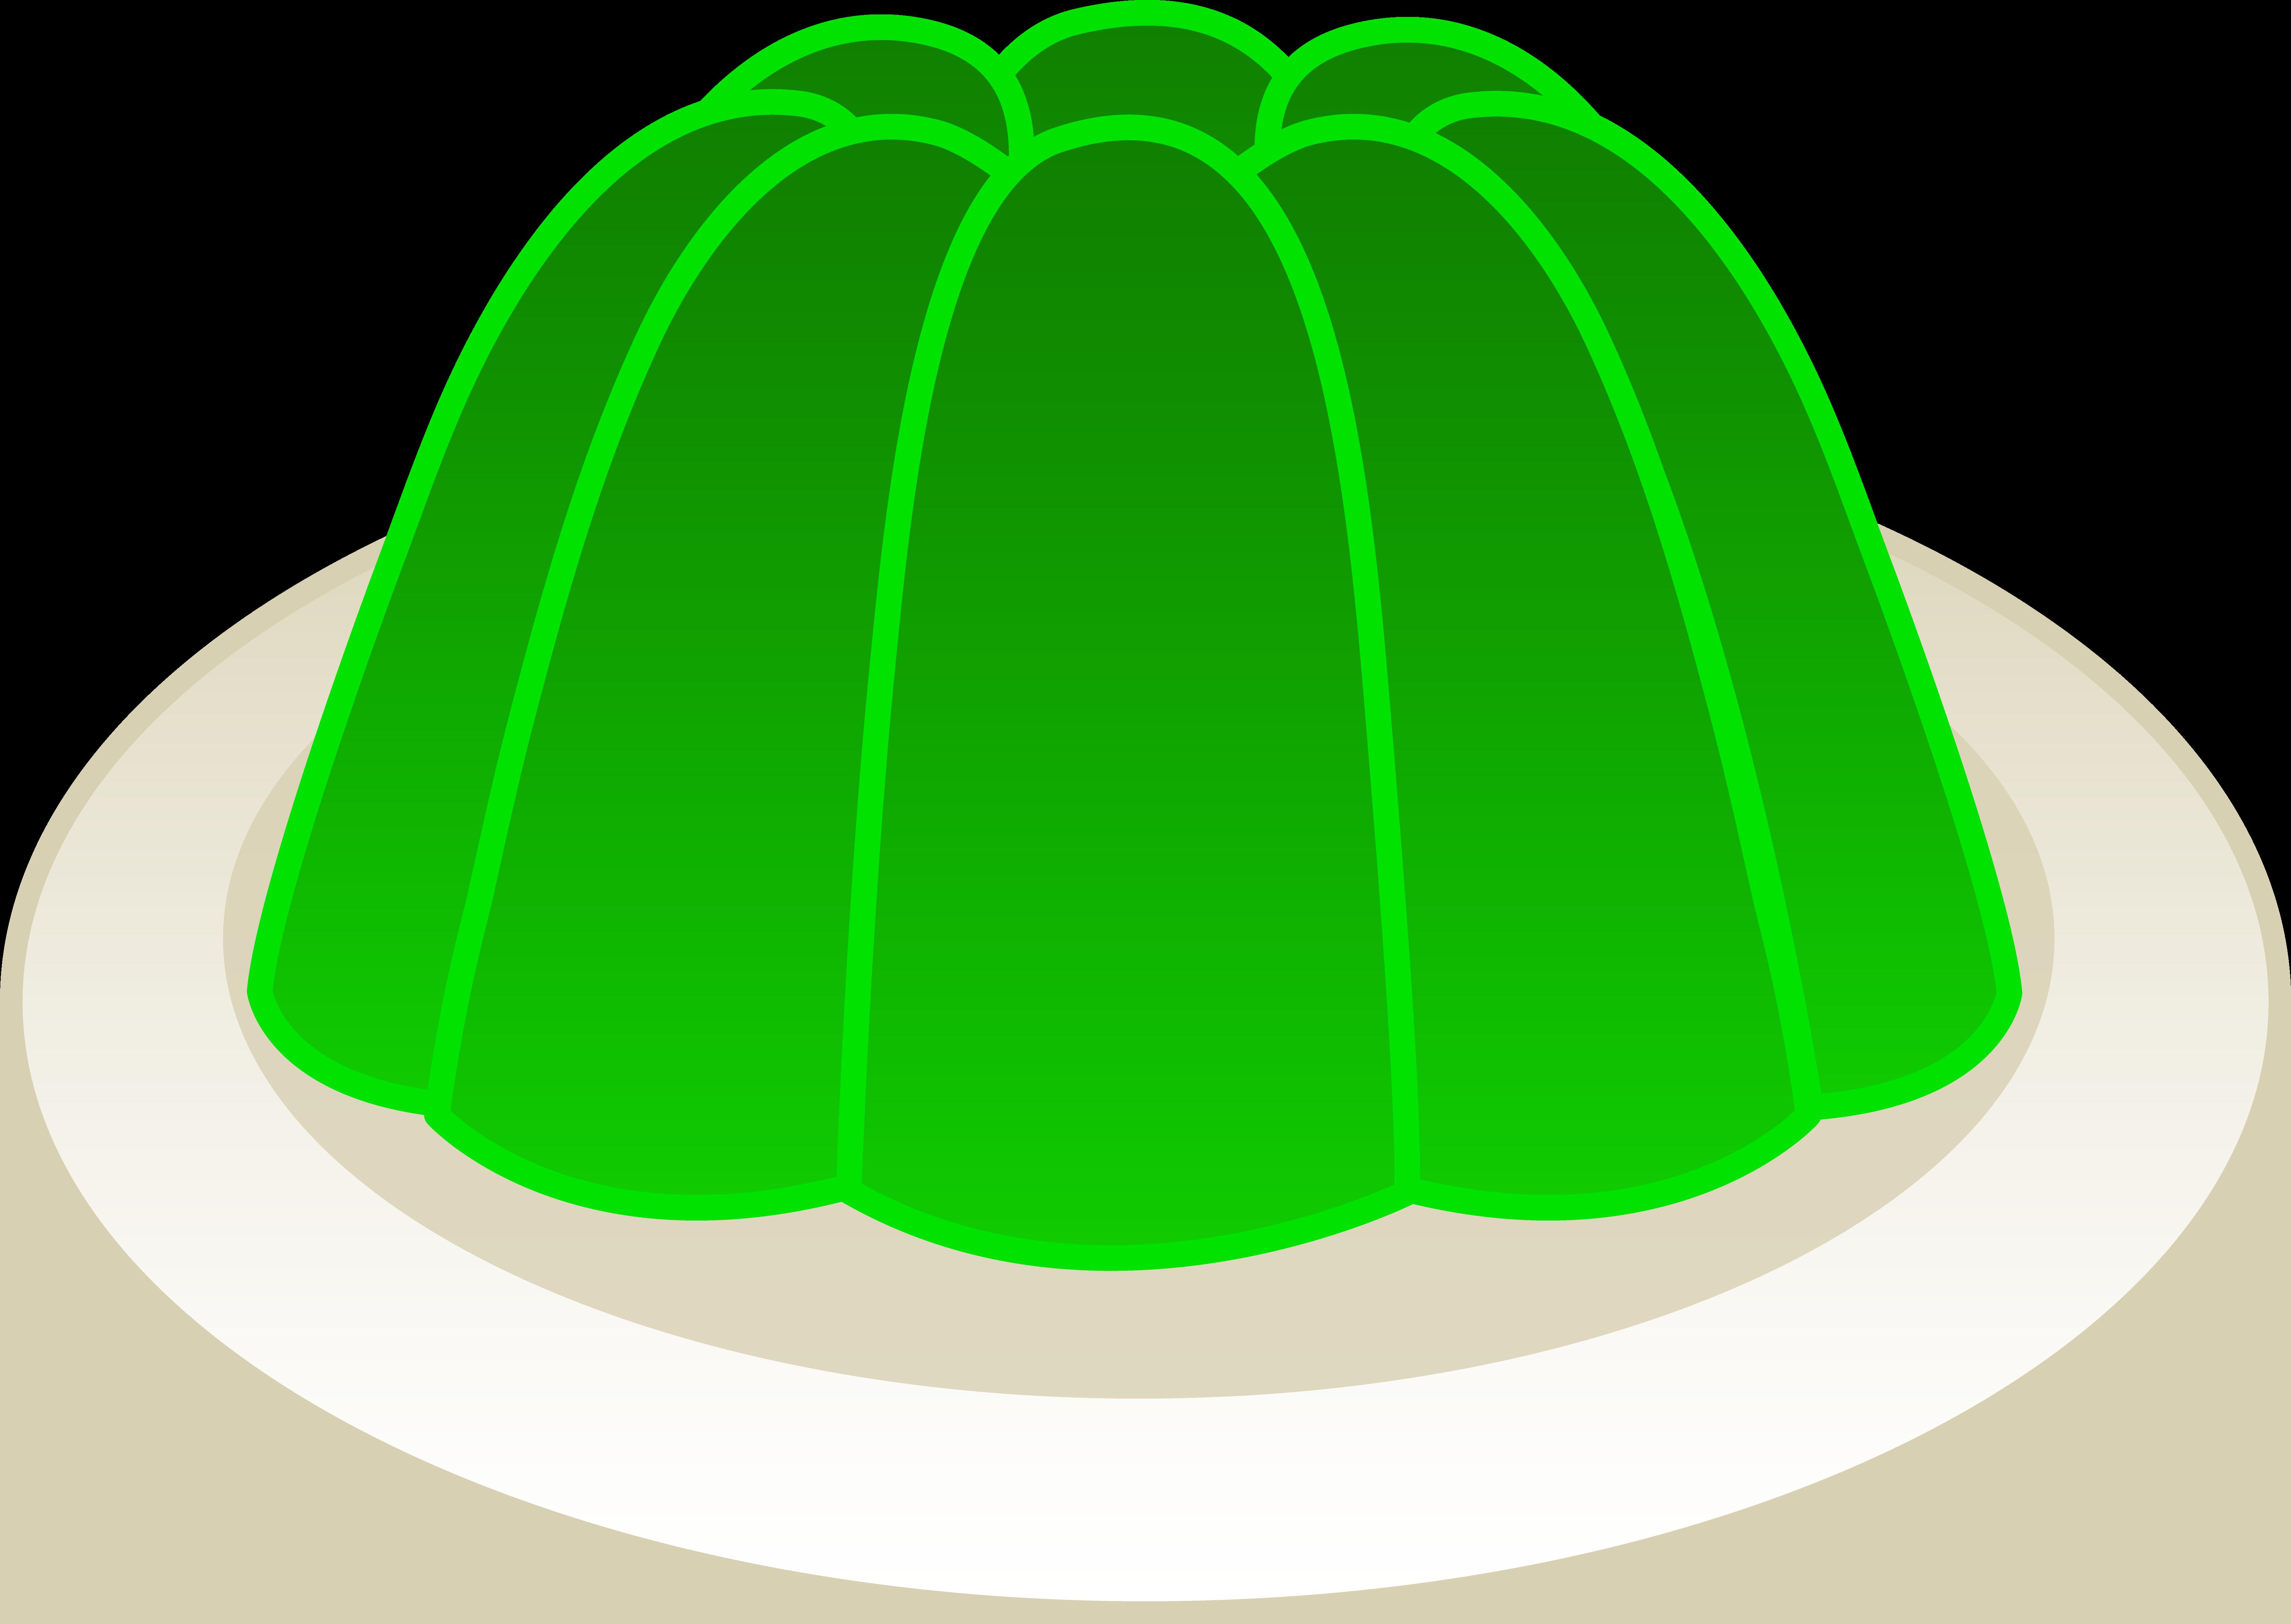 Green Cake Plate